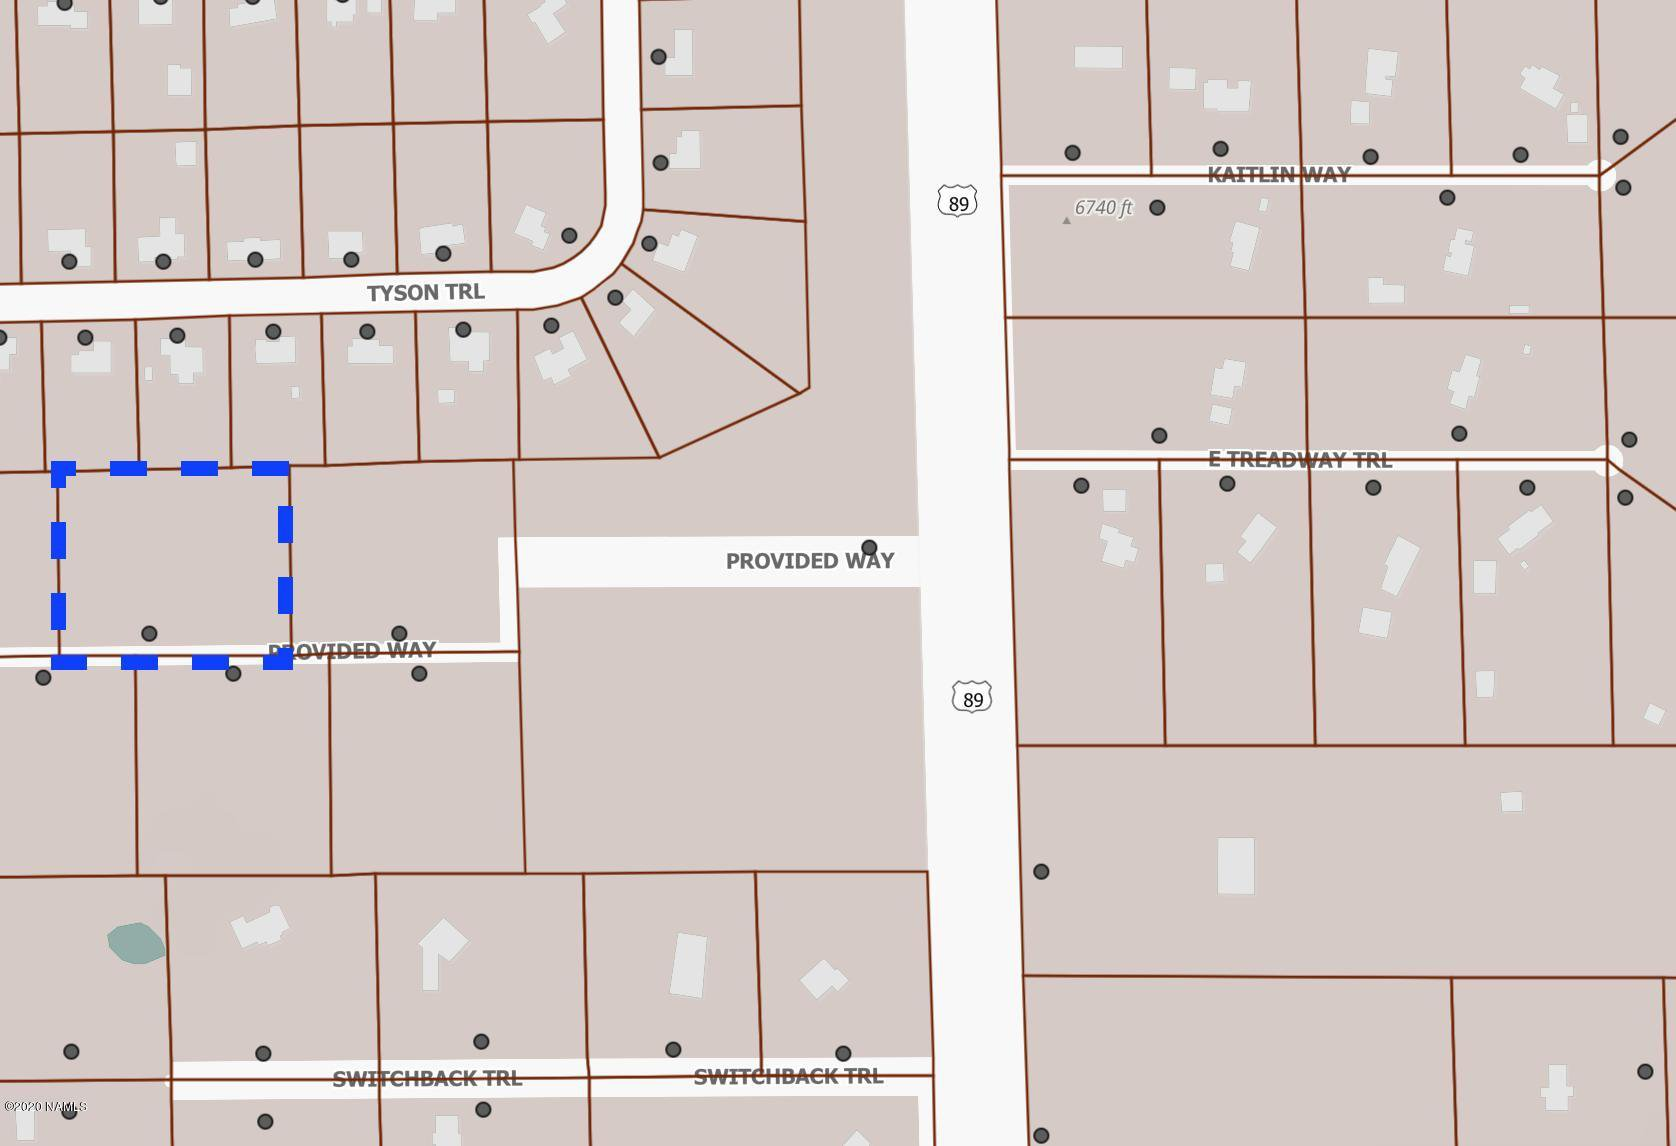 5770 Provided Way Way, Flagstaff, AZ 86003